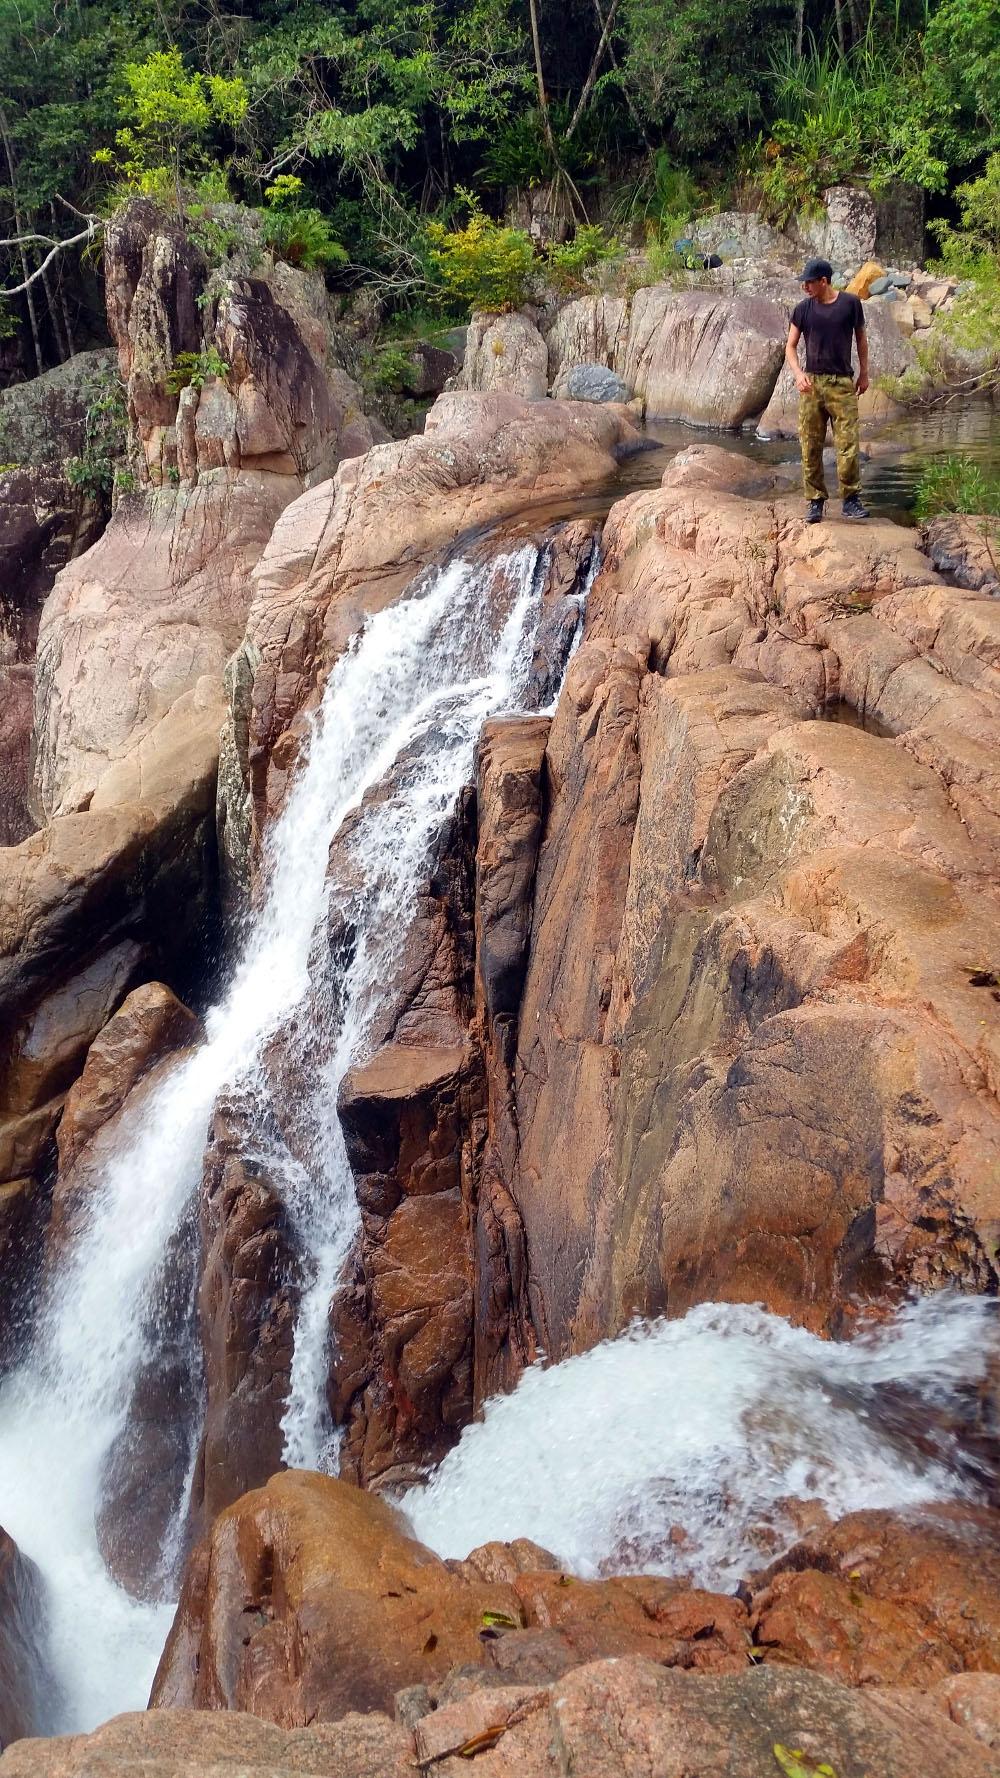 Matthew Robinson walking on top of a waterfall